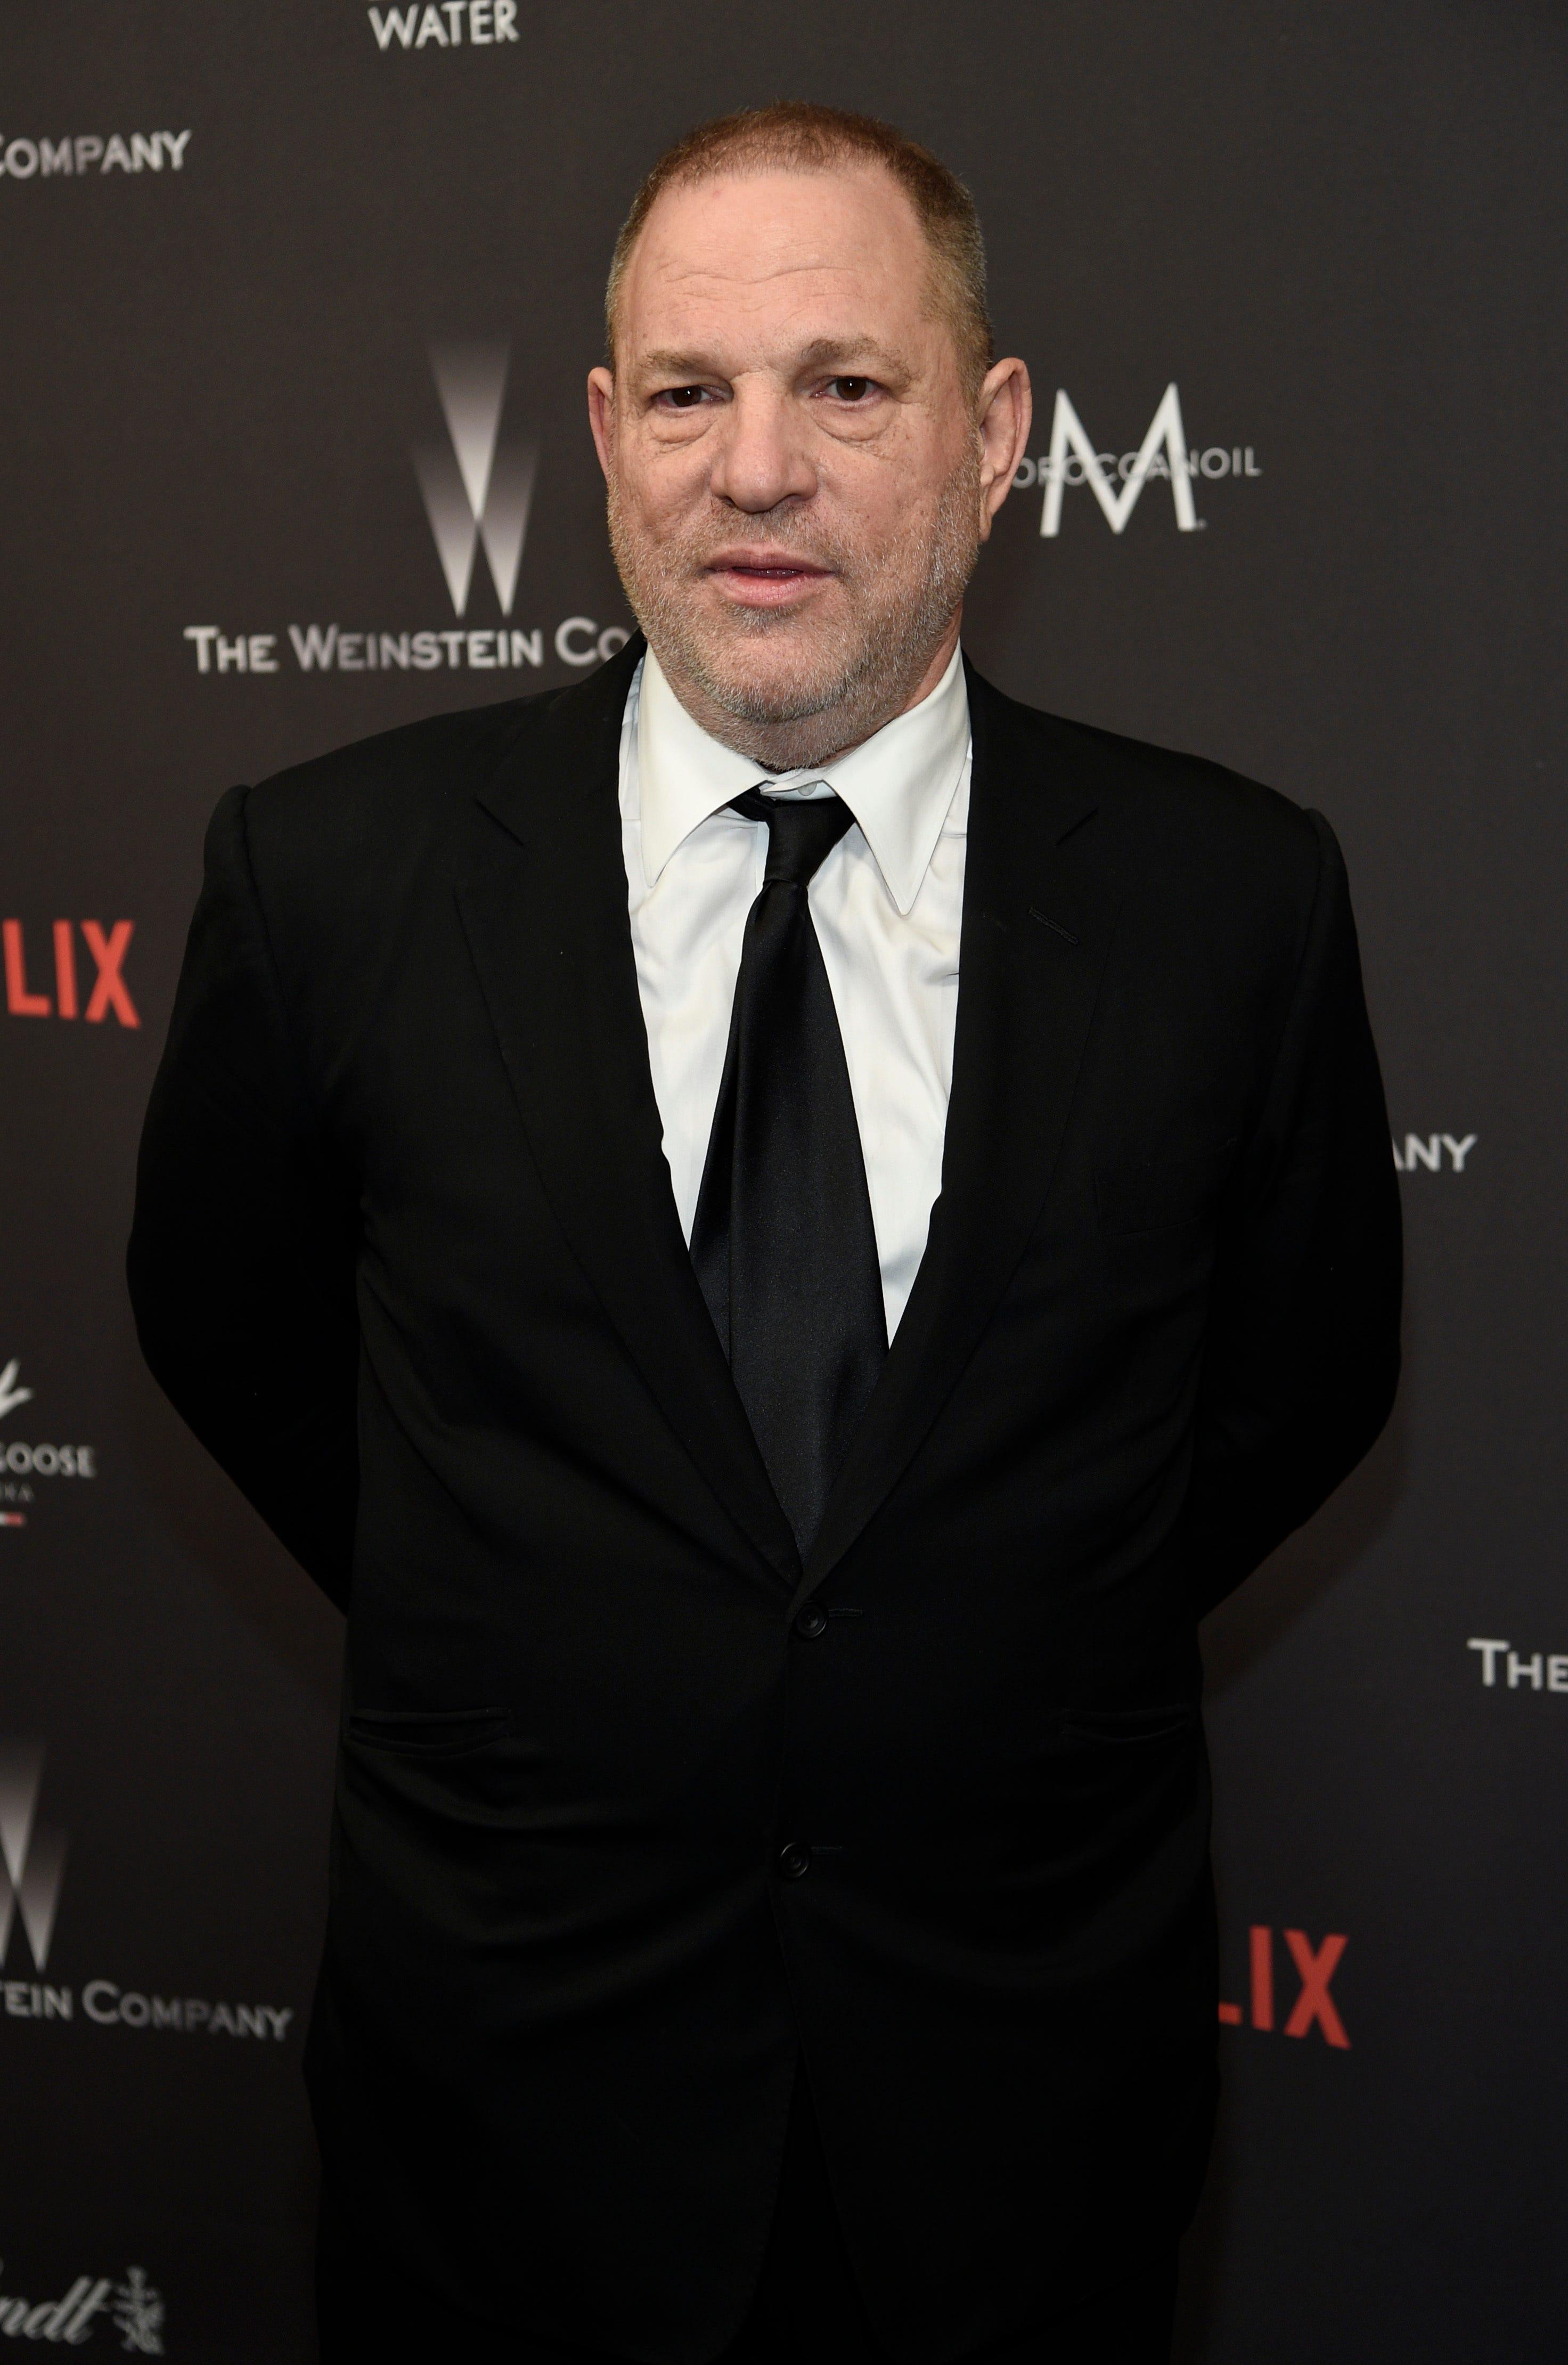 The Oscar odds for Harvey Weinstein's award movies now look dim